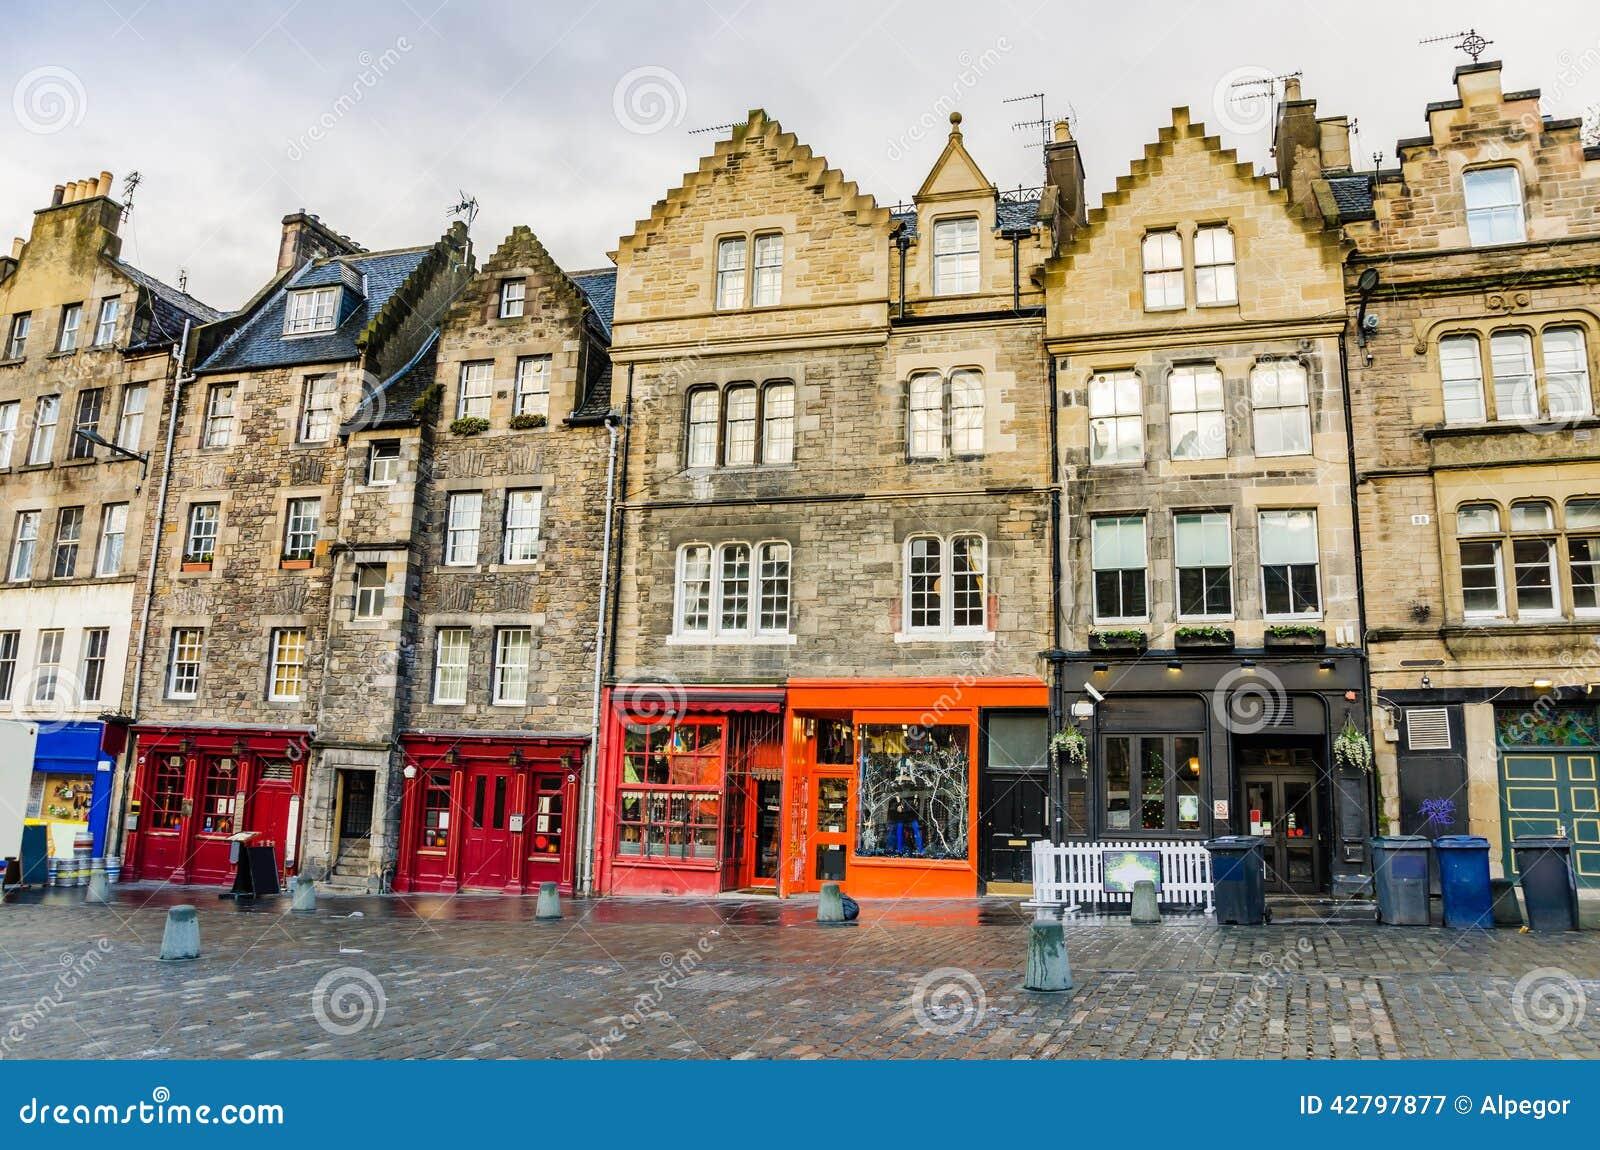 Colourful Shopfronts in Edinburgh Old Town